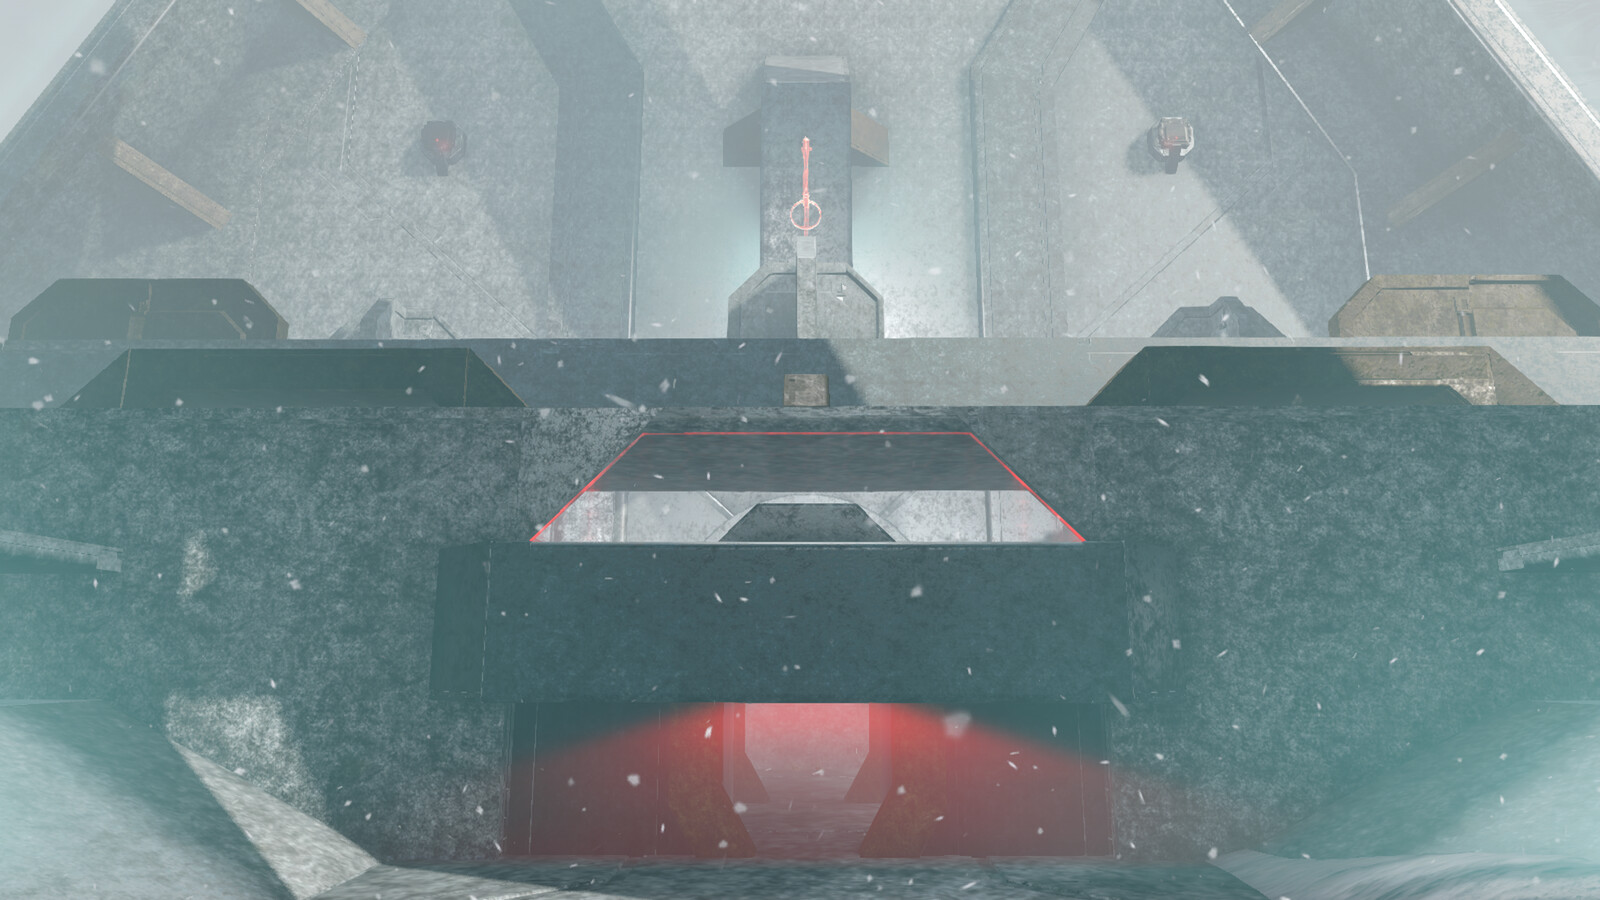 Red base outside